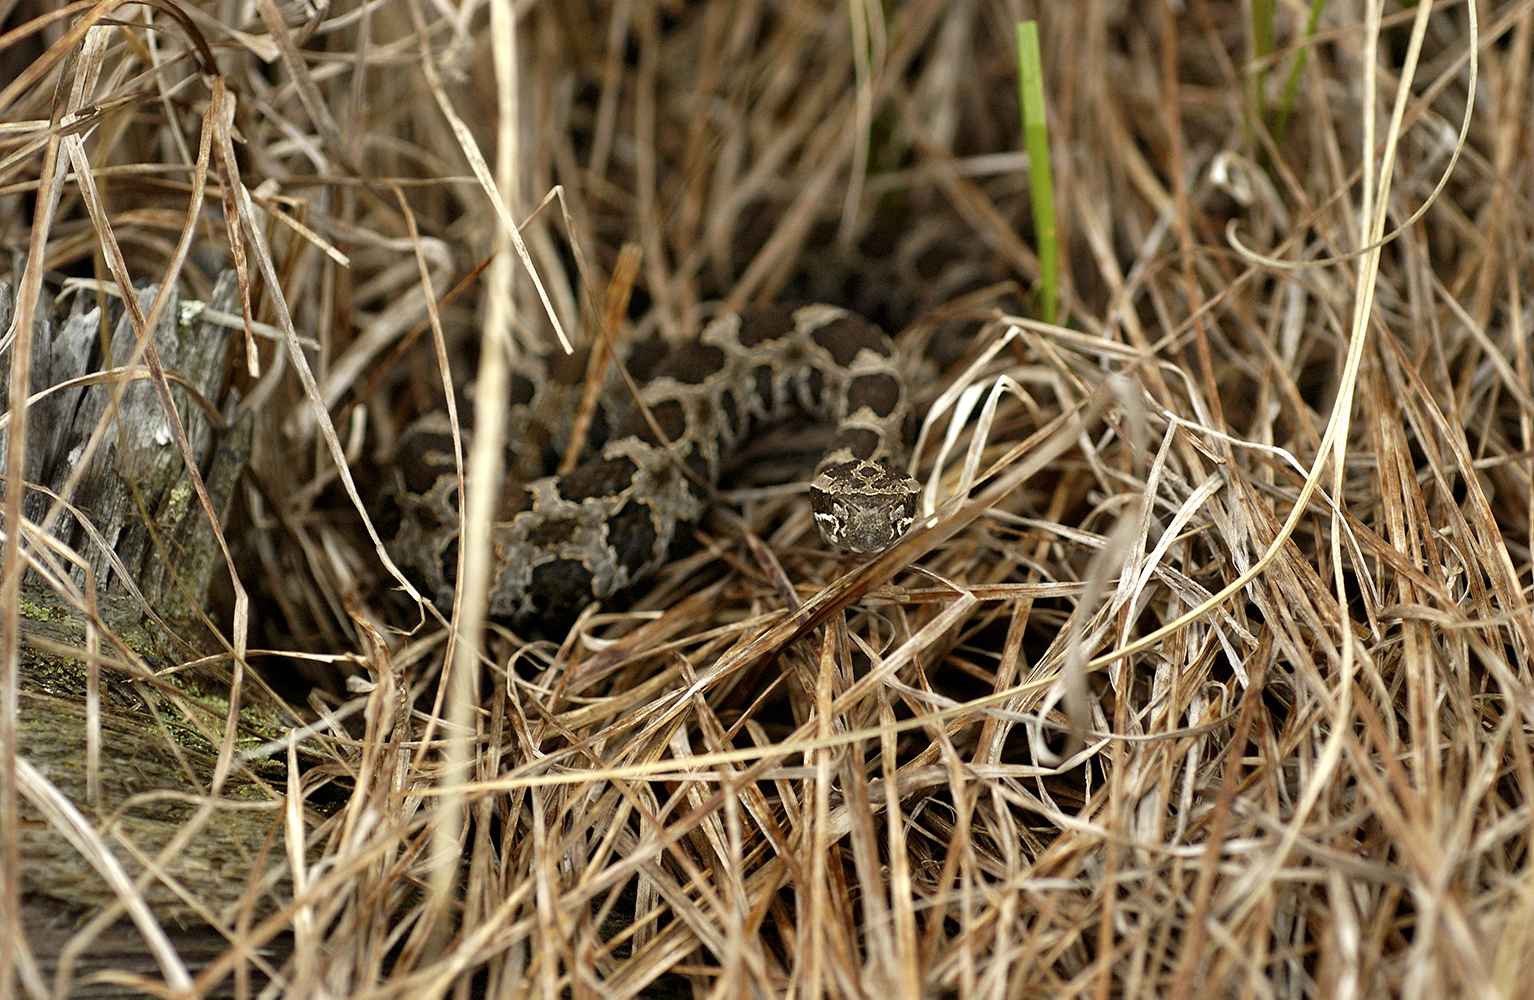 The massasauga rattlesnake is Michigan's only venomous snake.